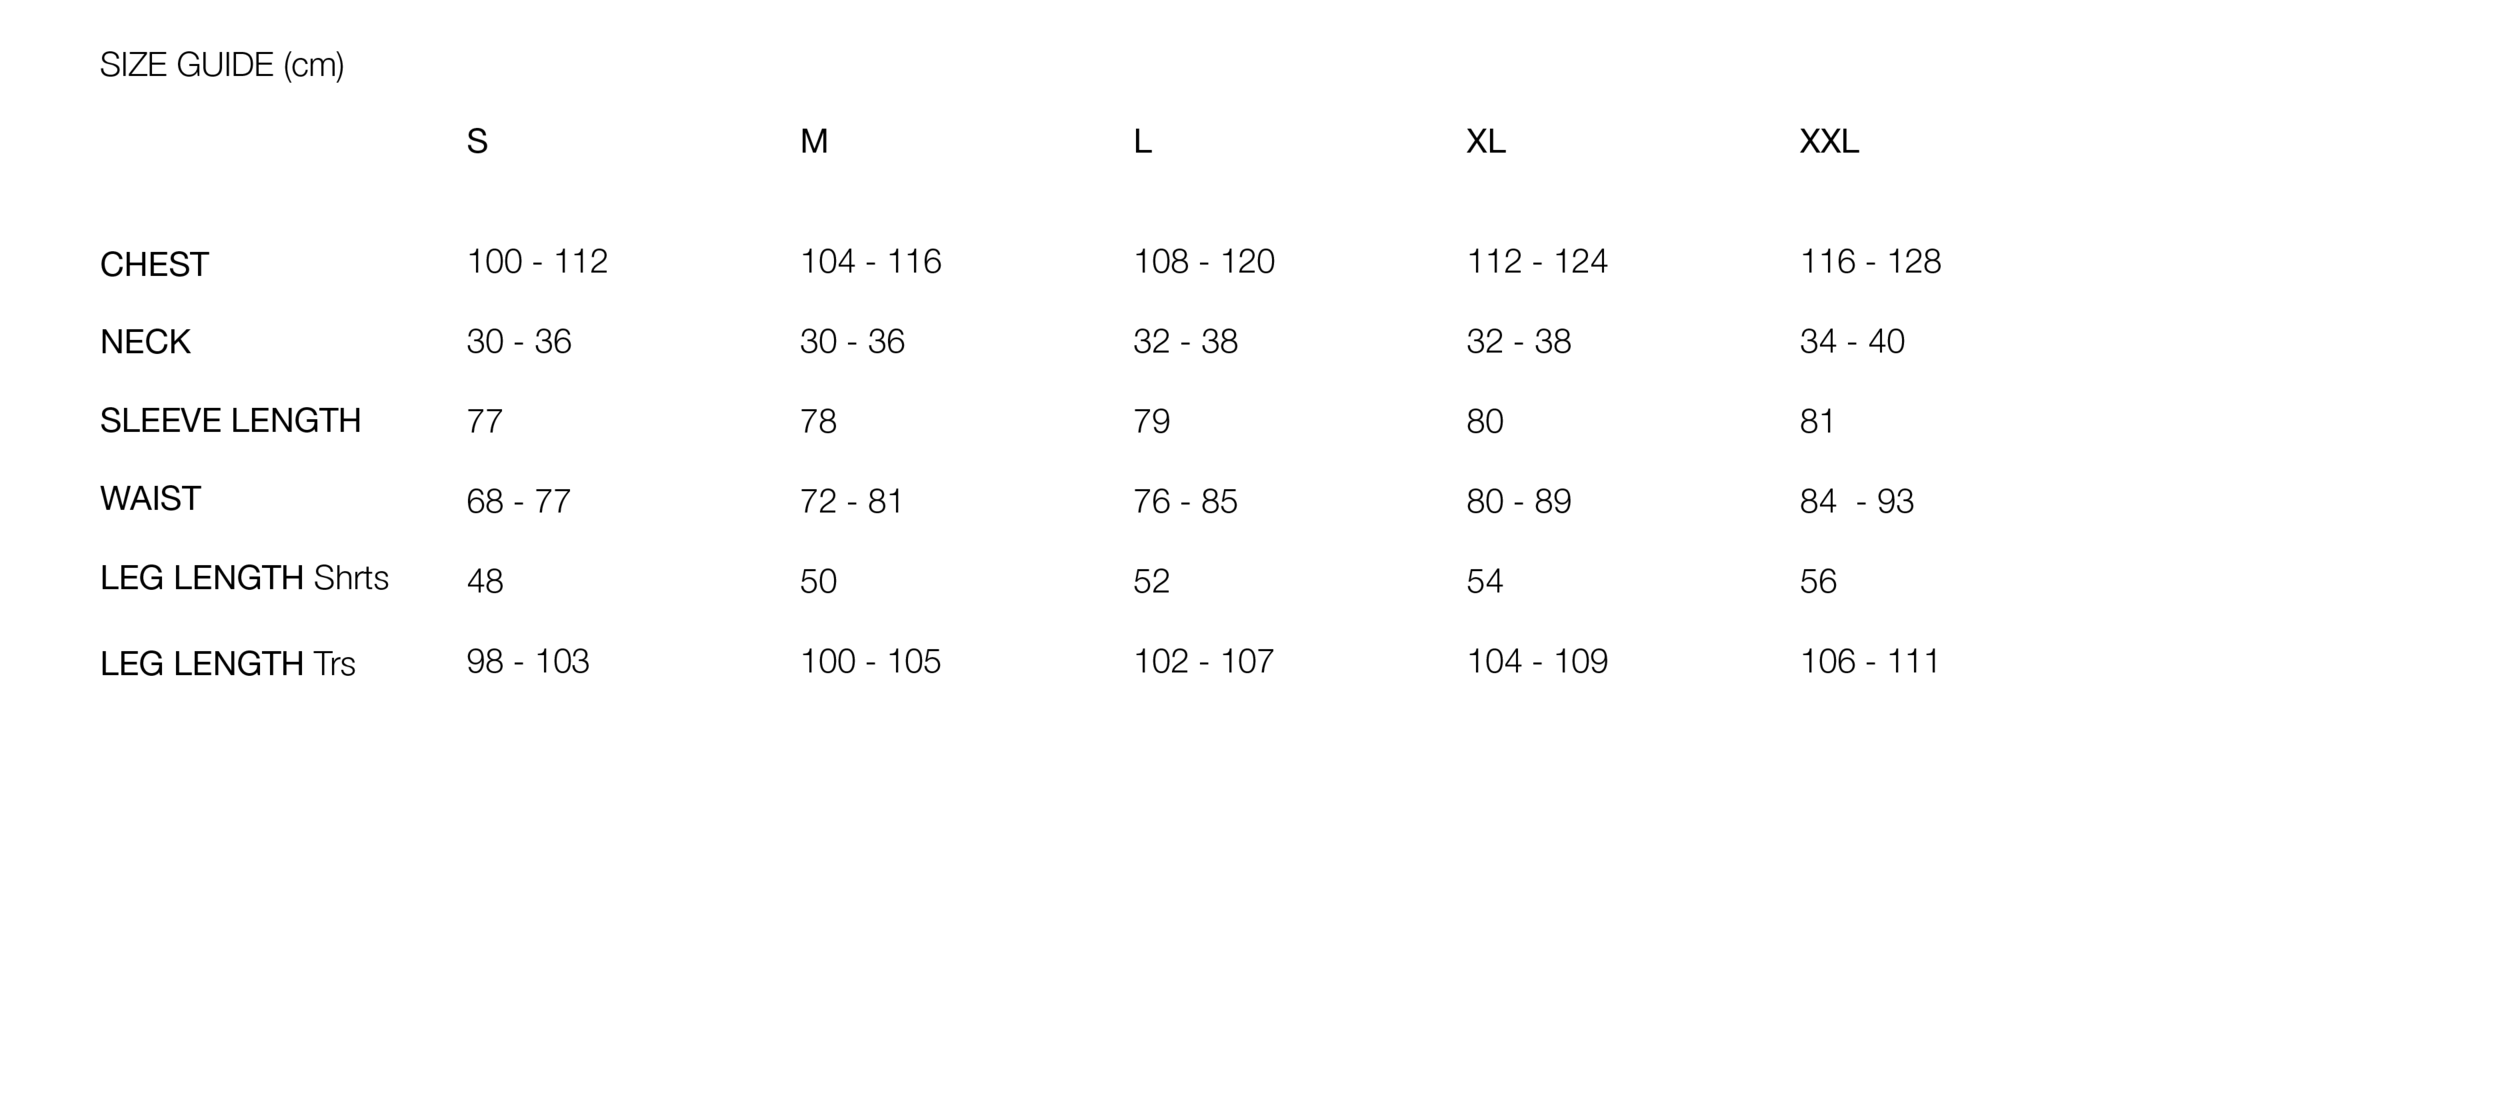 LBSIZEGUIDE19.png